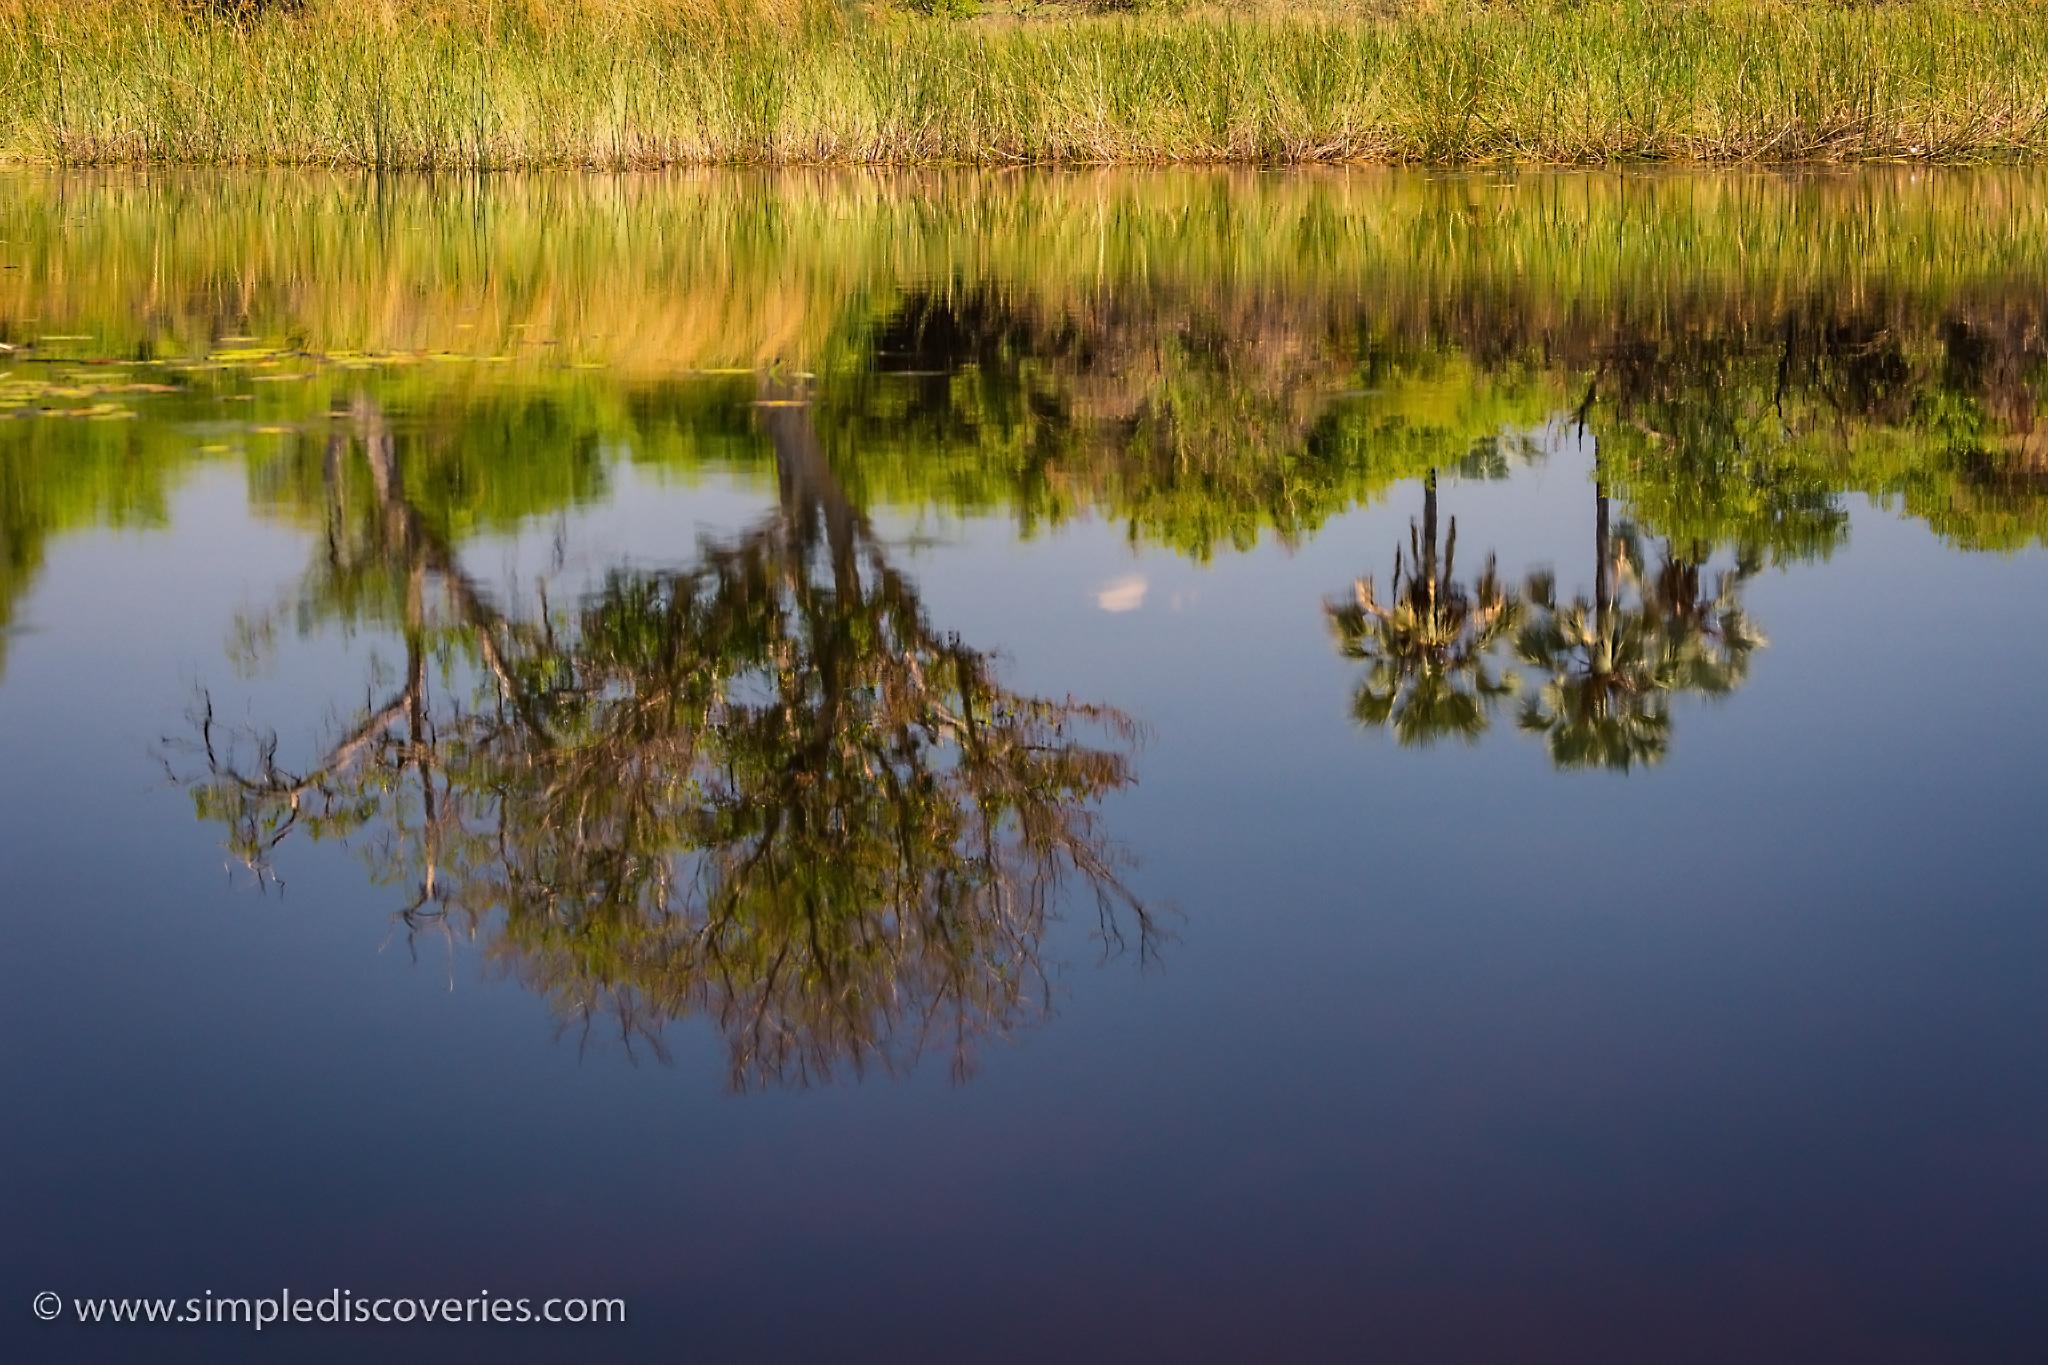 okavango_delta_reflection